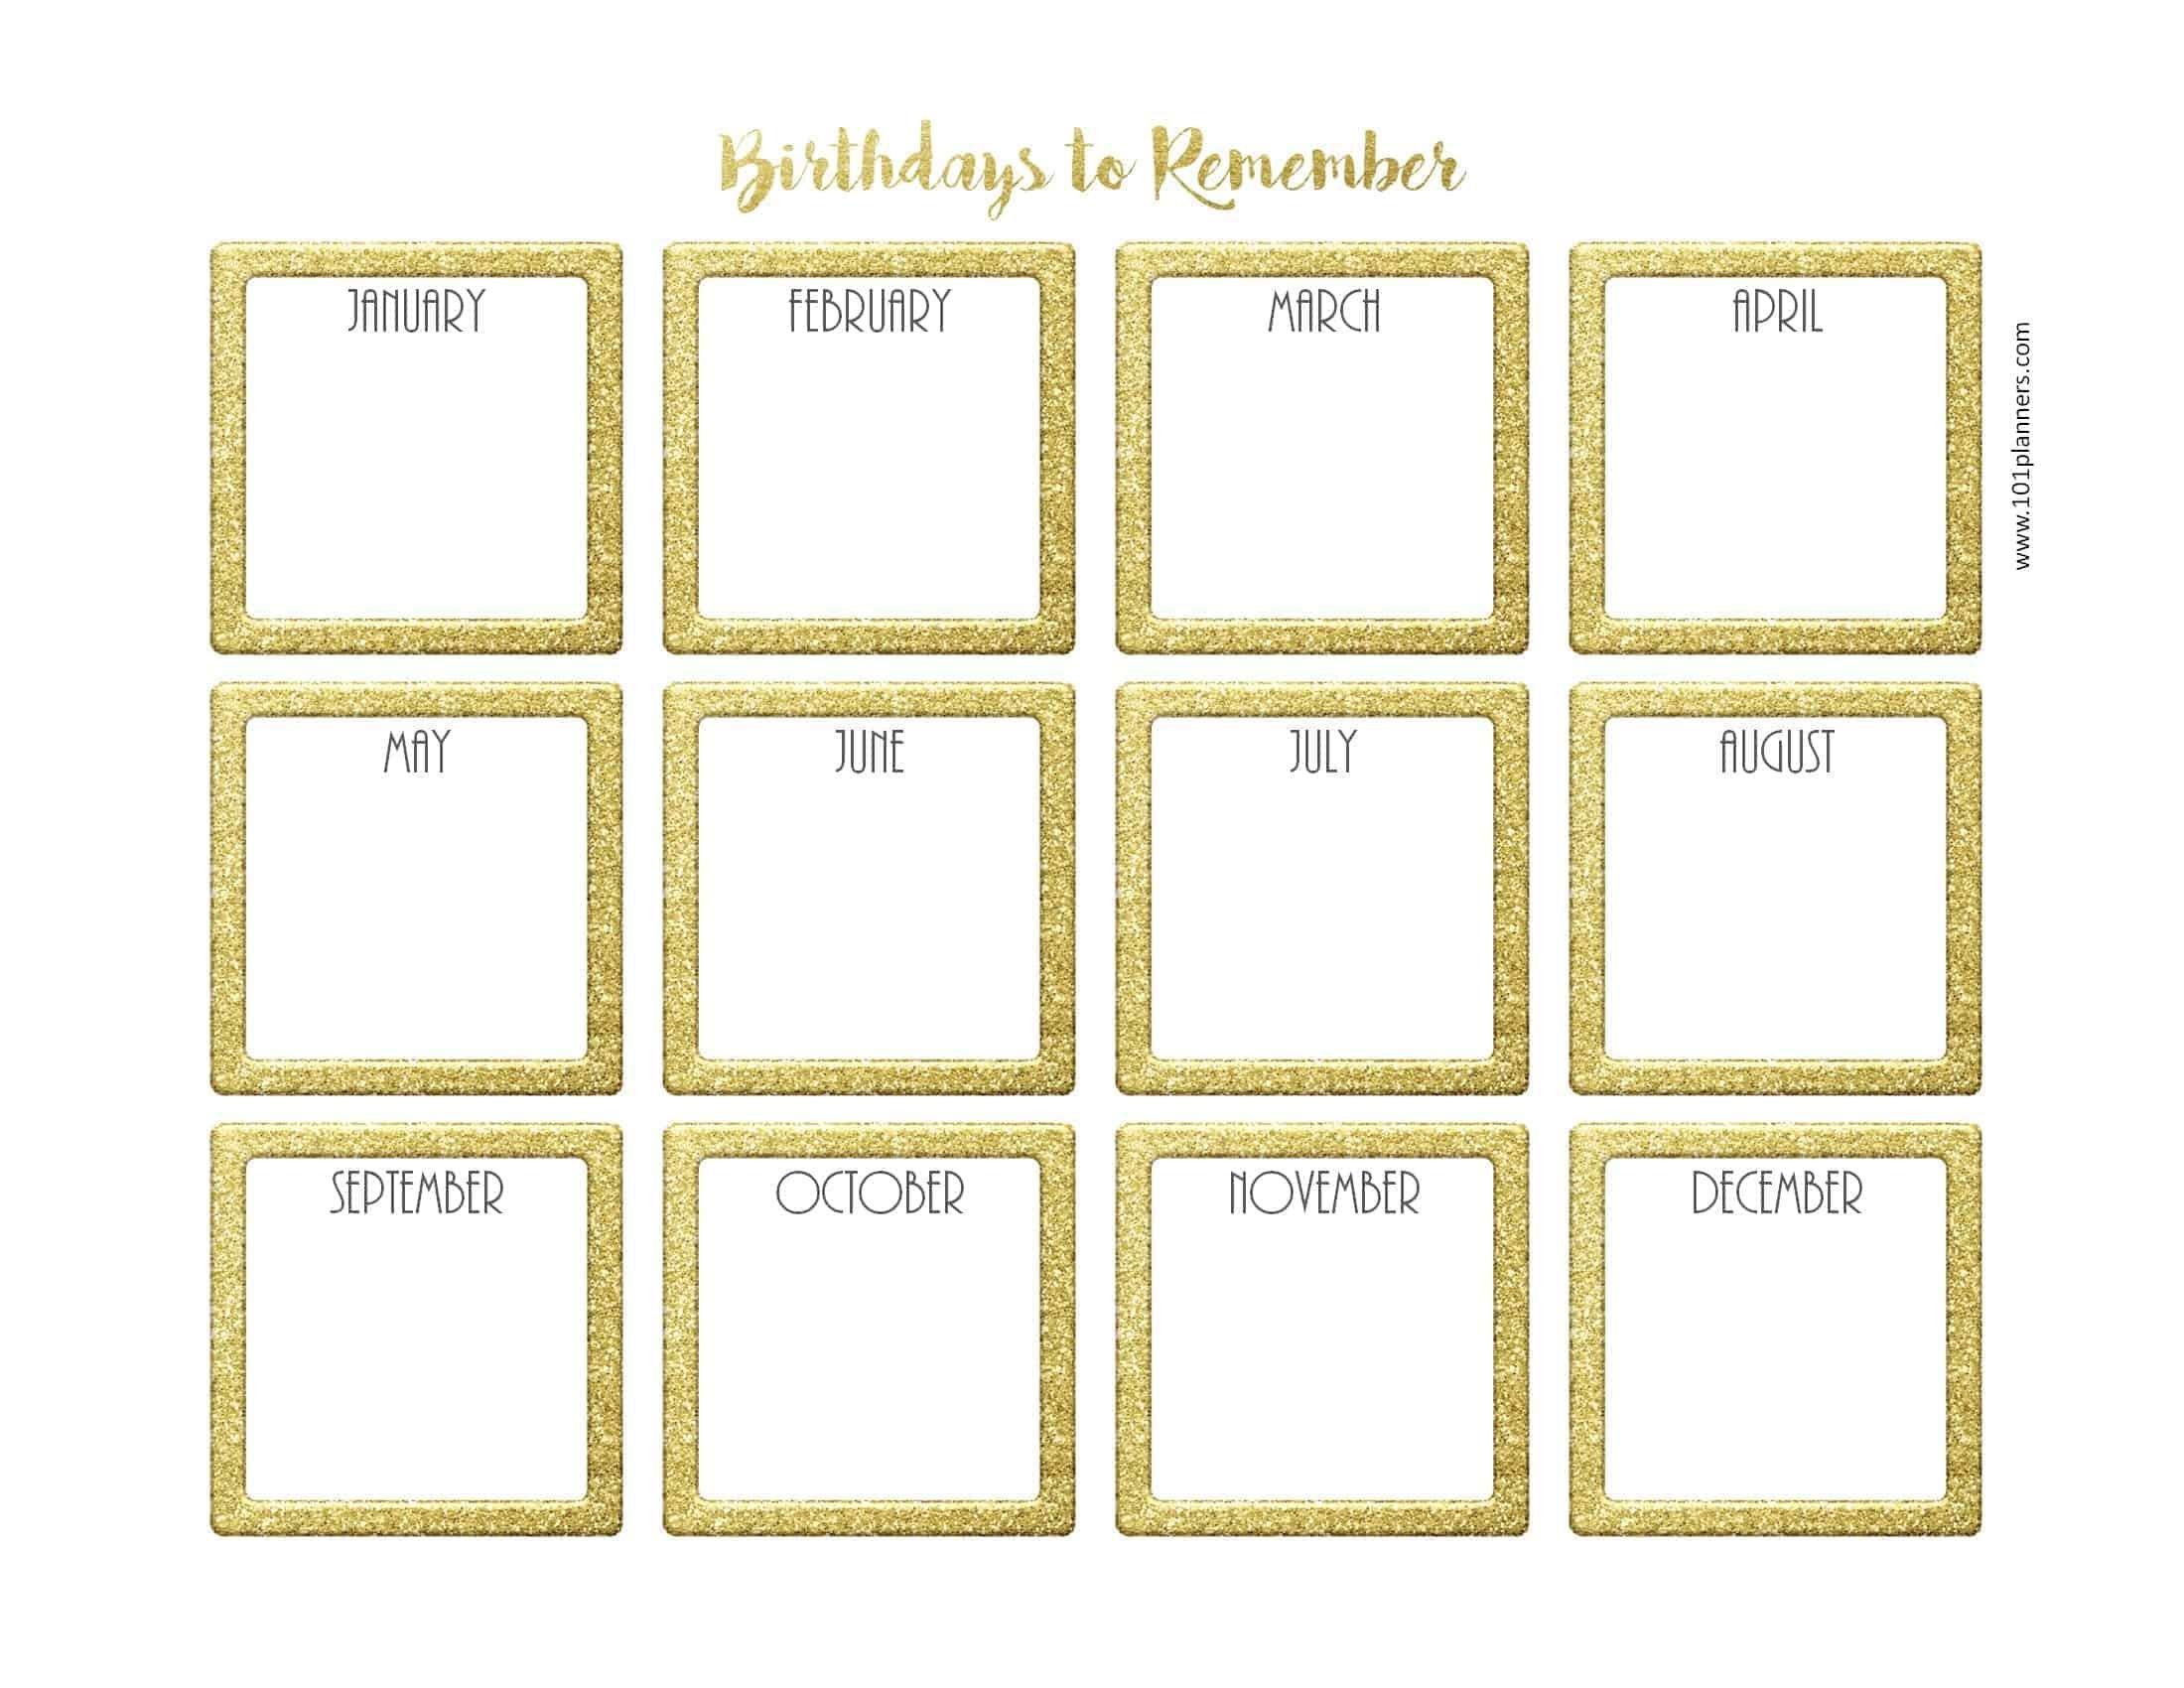 Birthday Calendar Template Free Birthday Calendar For The Workplace